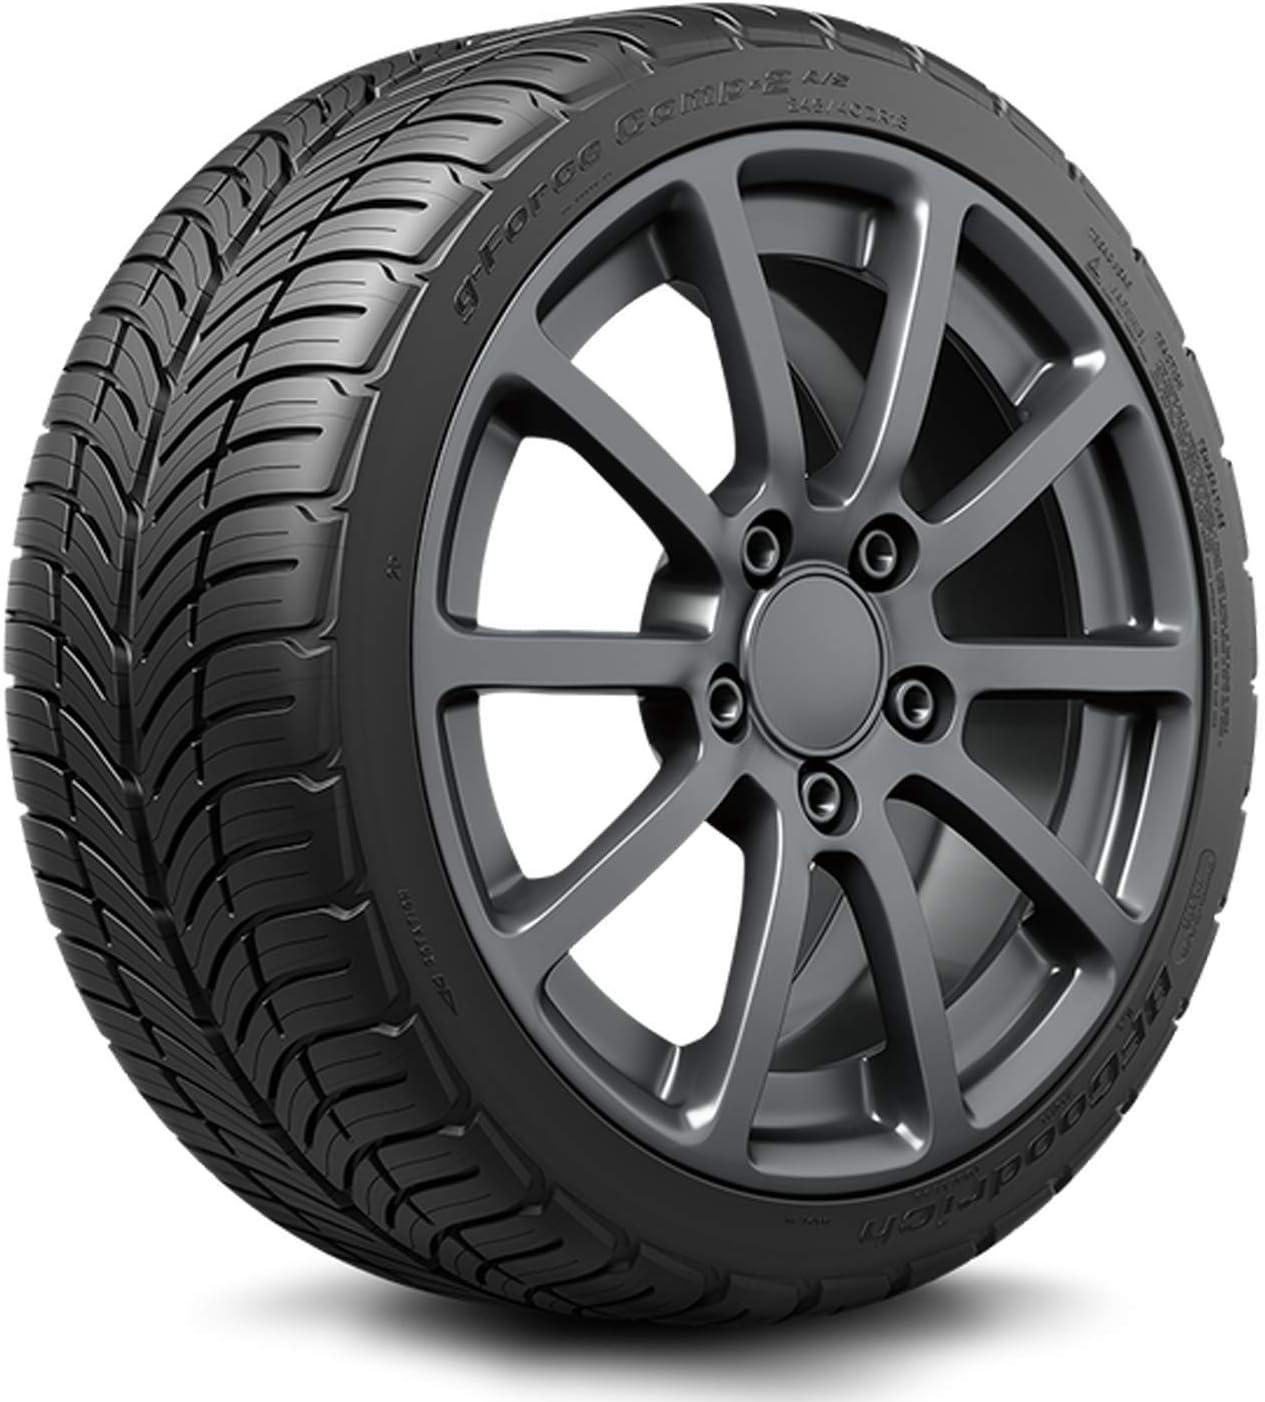 BFGoodrich g-Force Indefinitely COMP-2 A S Plus Season 285 XL Tire quality assurance All 35ZR20